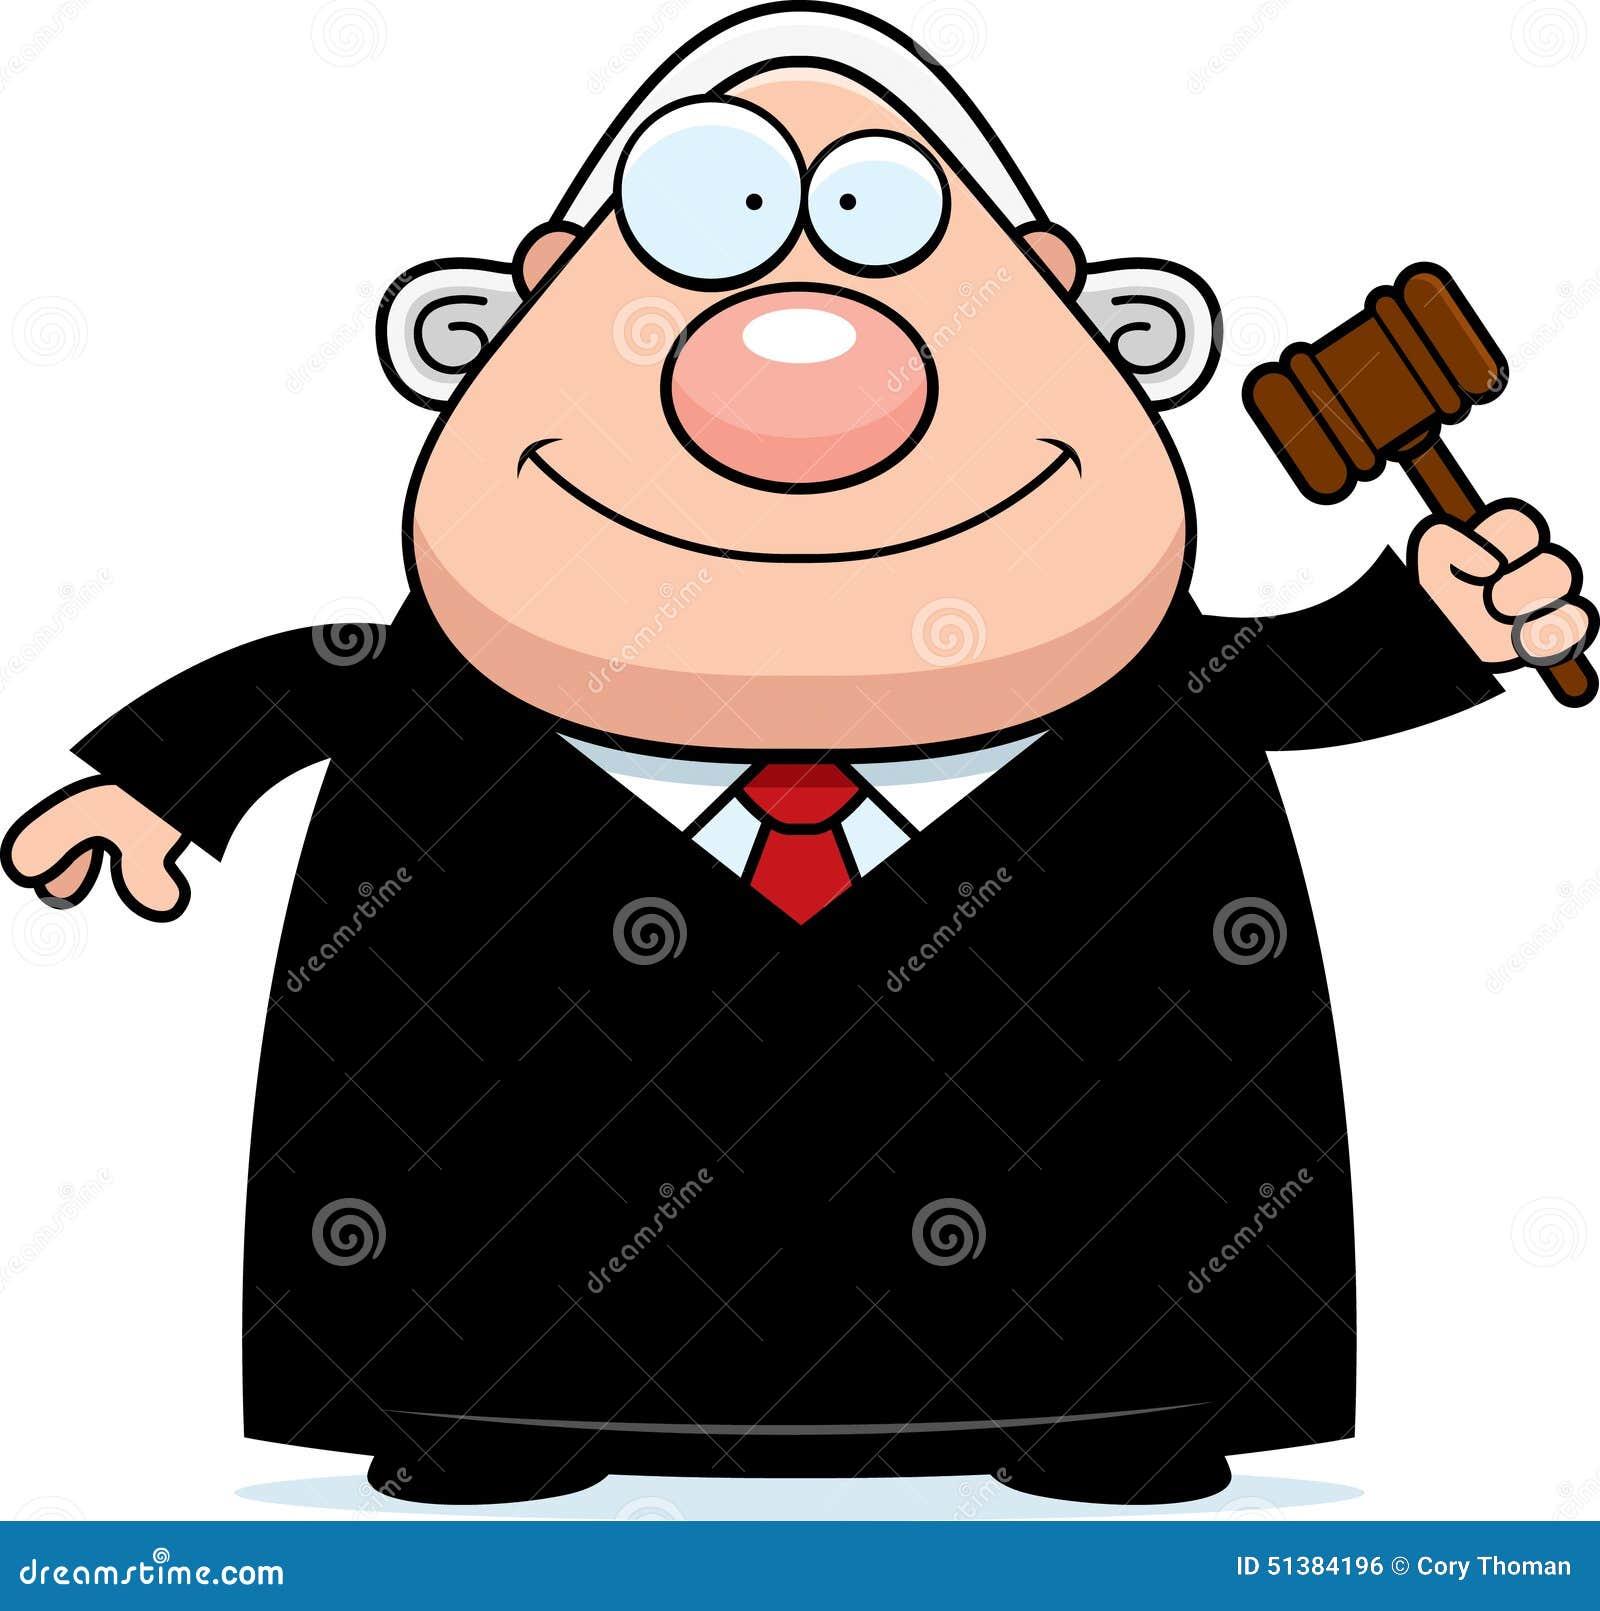 Cartoon Judge Gavel Stock Vector - Image: 51384196